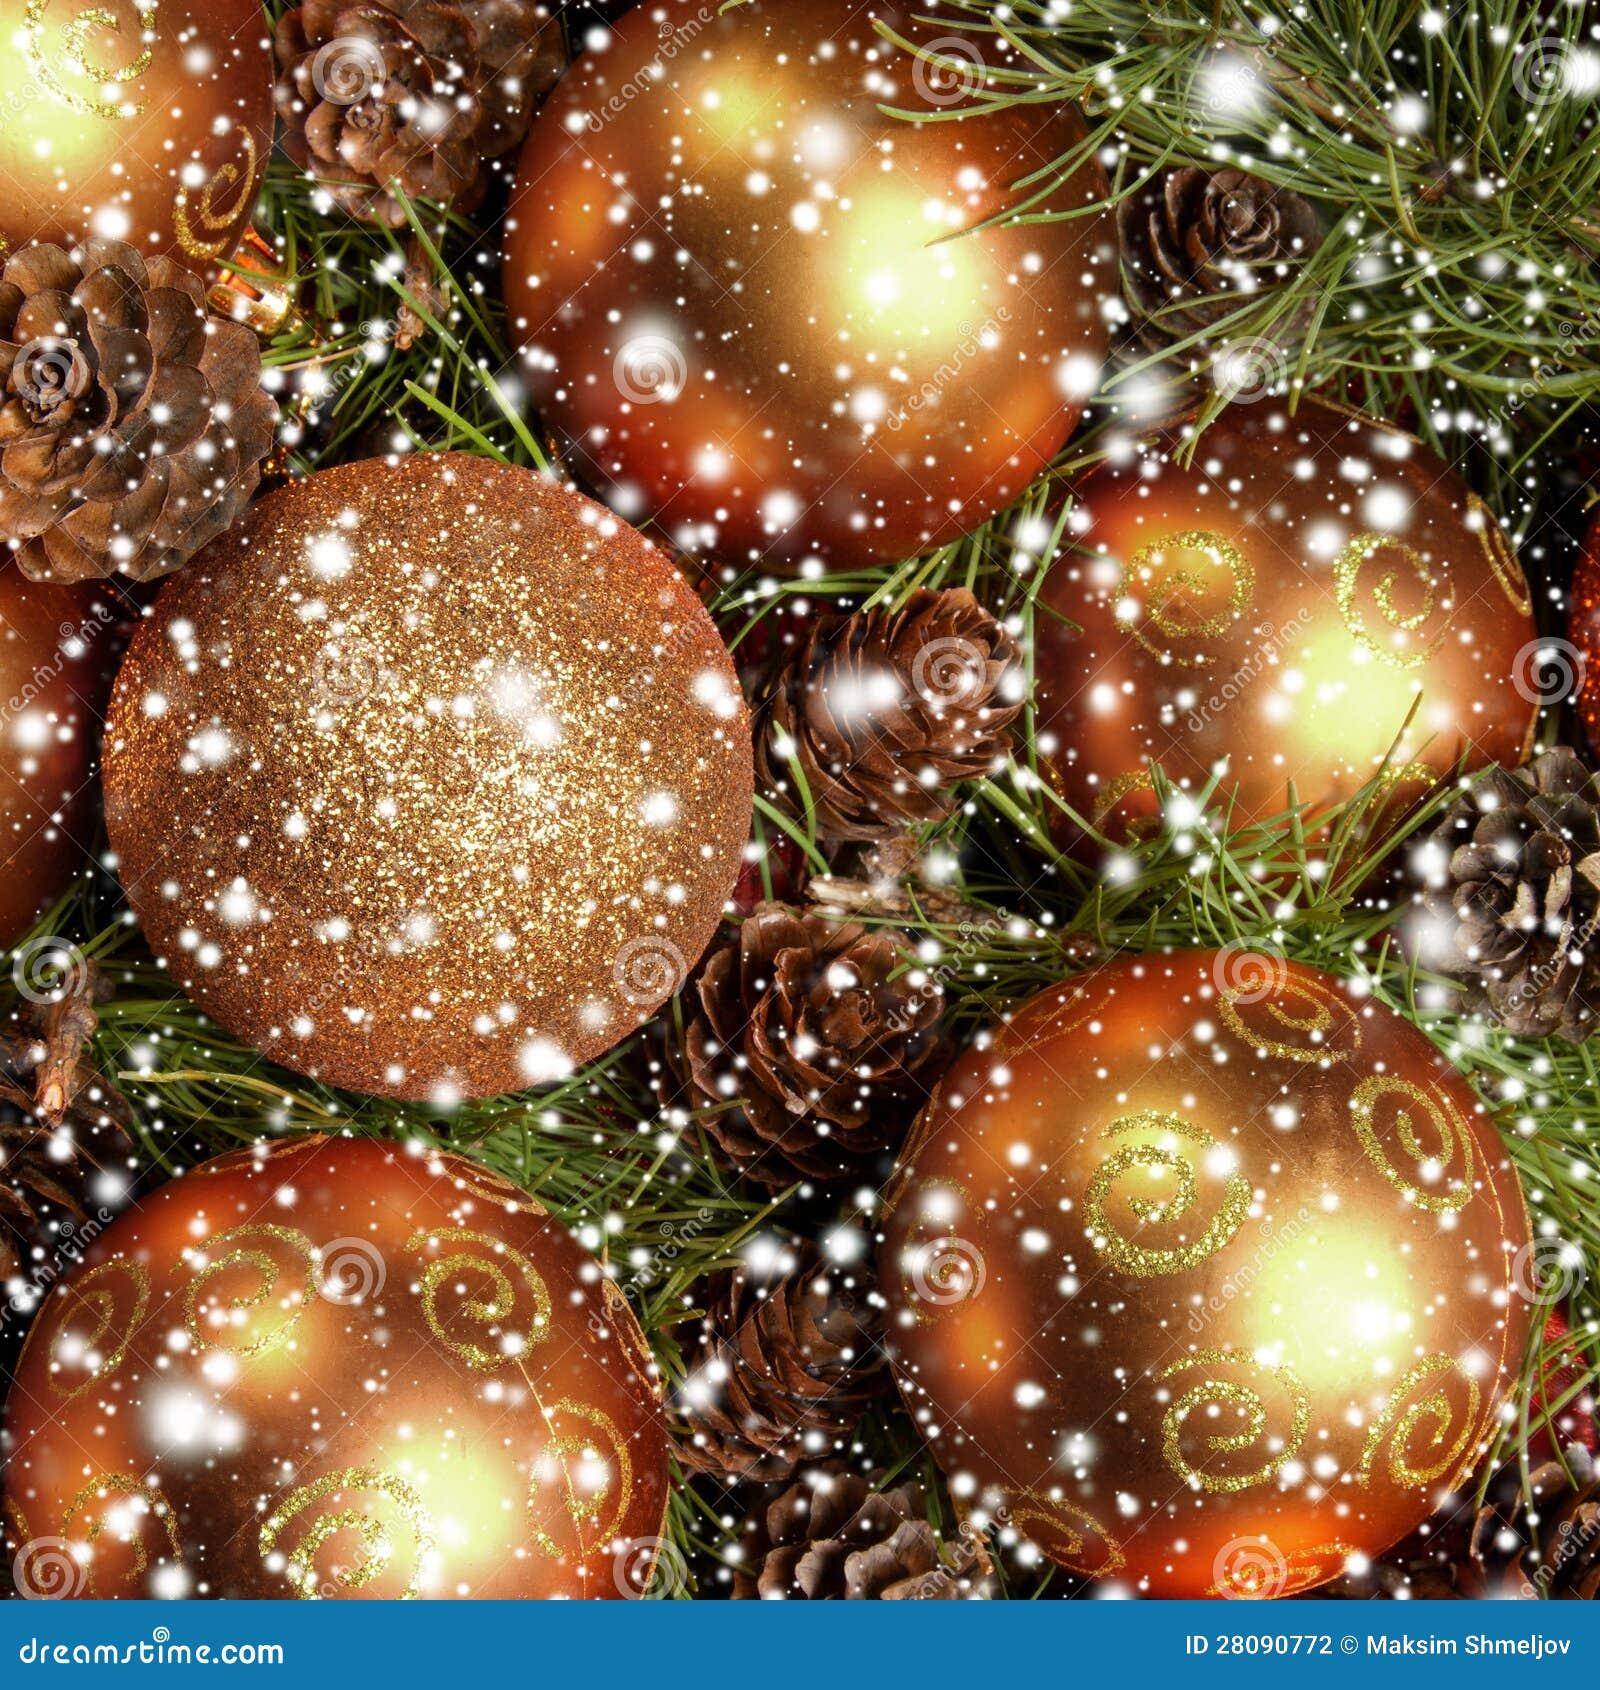 Bellissime Foto Di Natale.Immagini Di Natale Bellissime Disegni Di Natale 2019